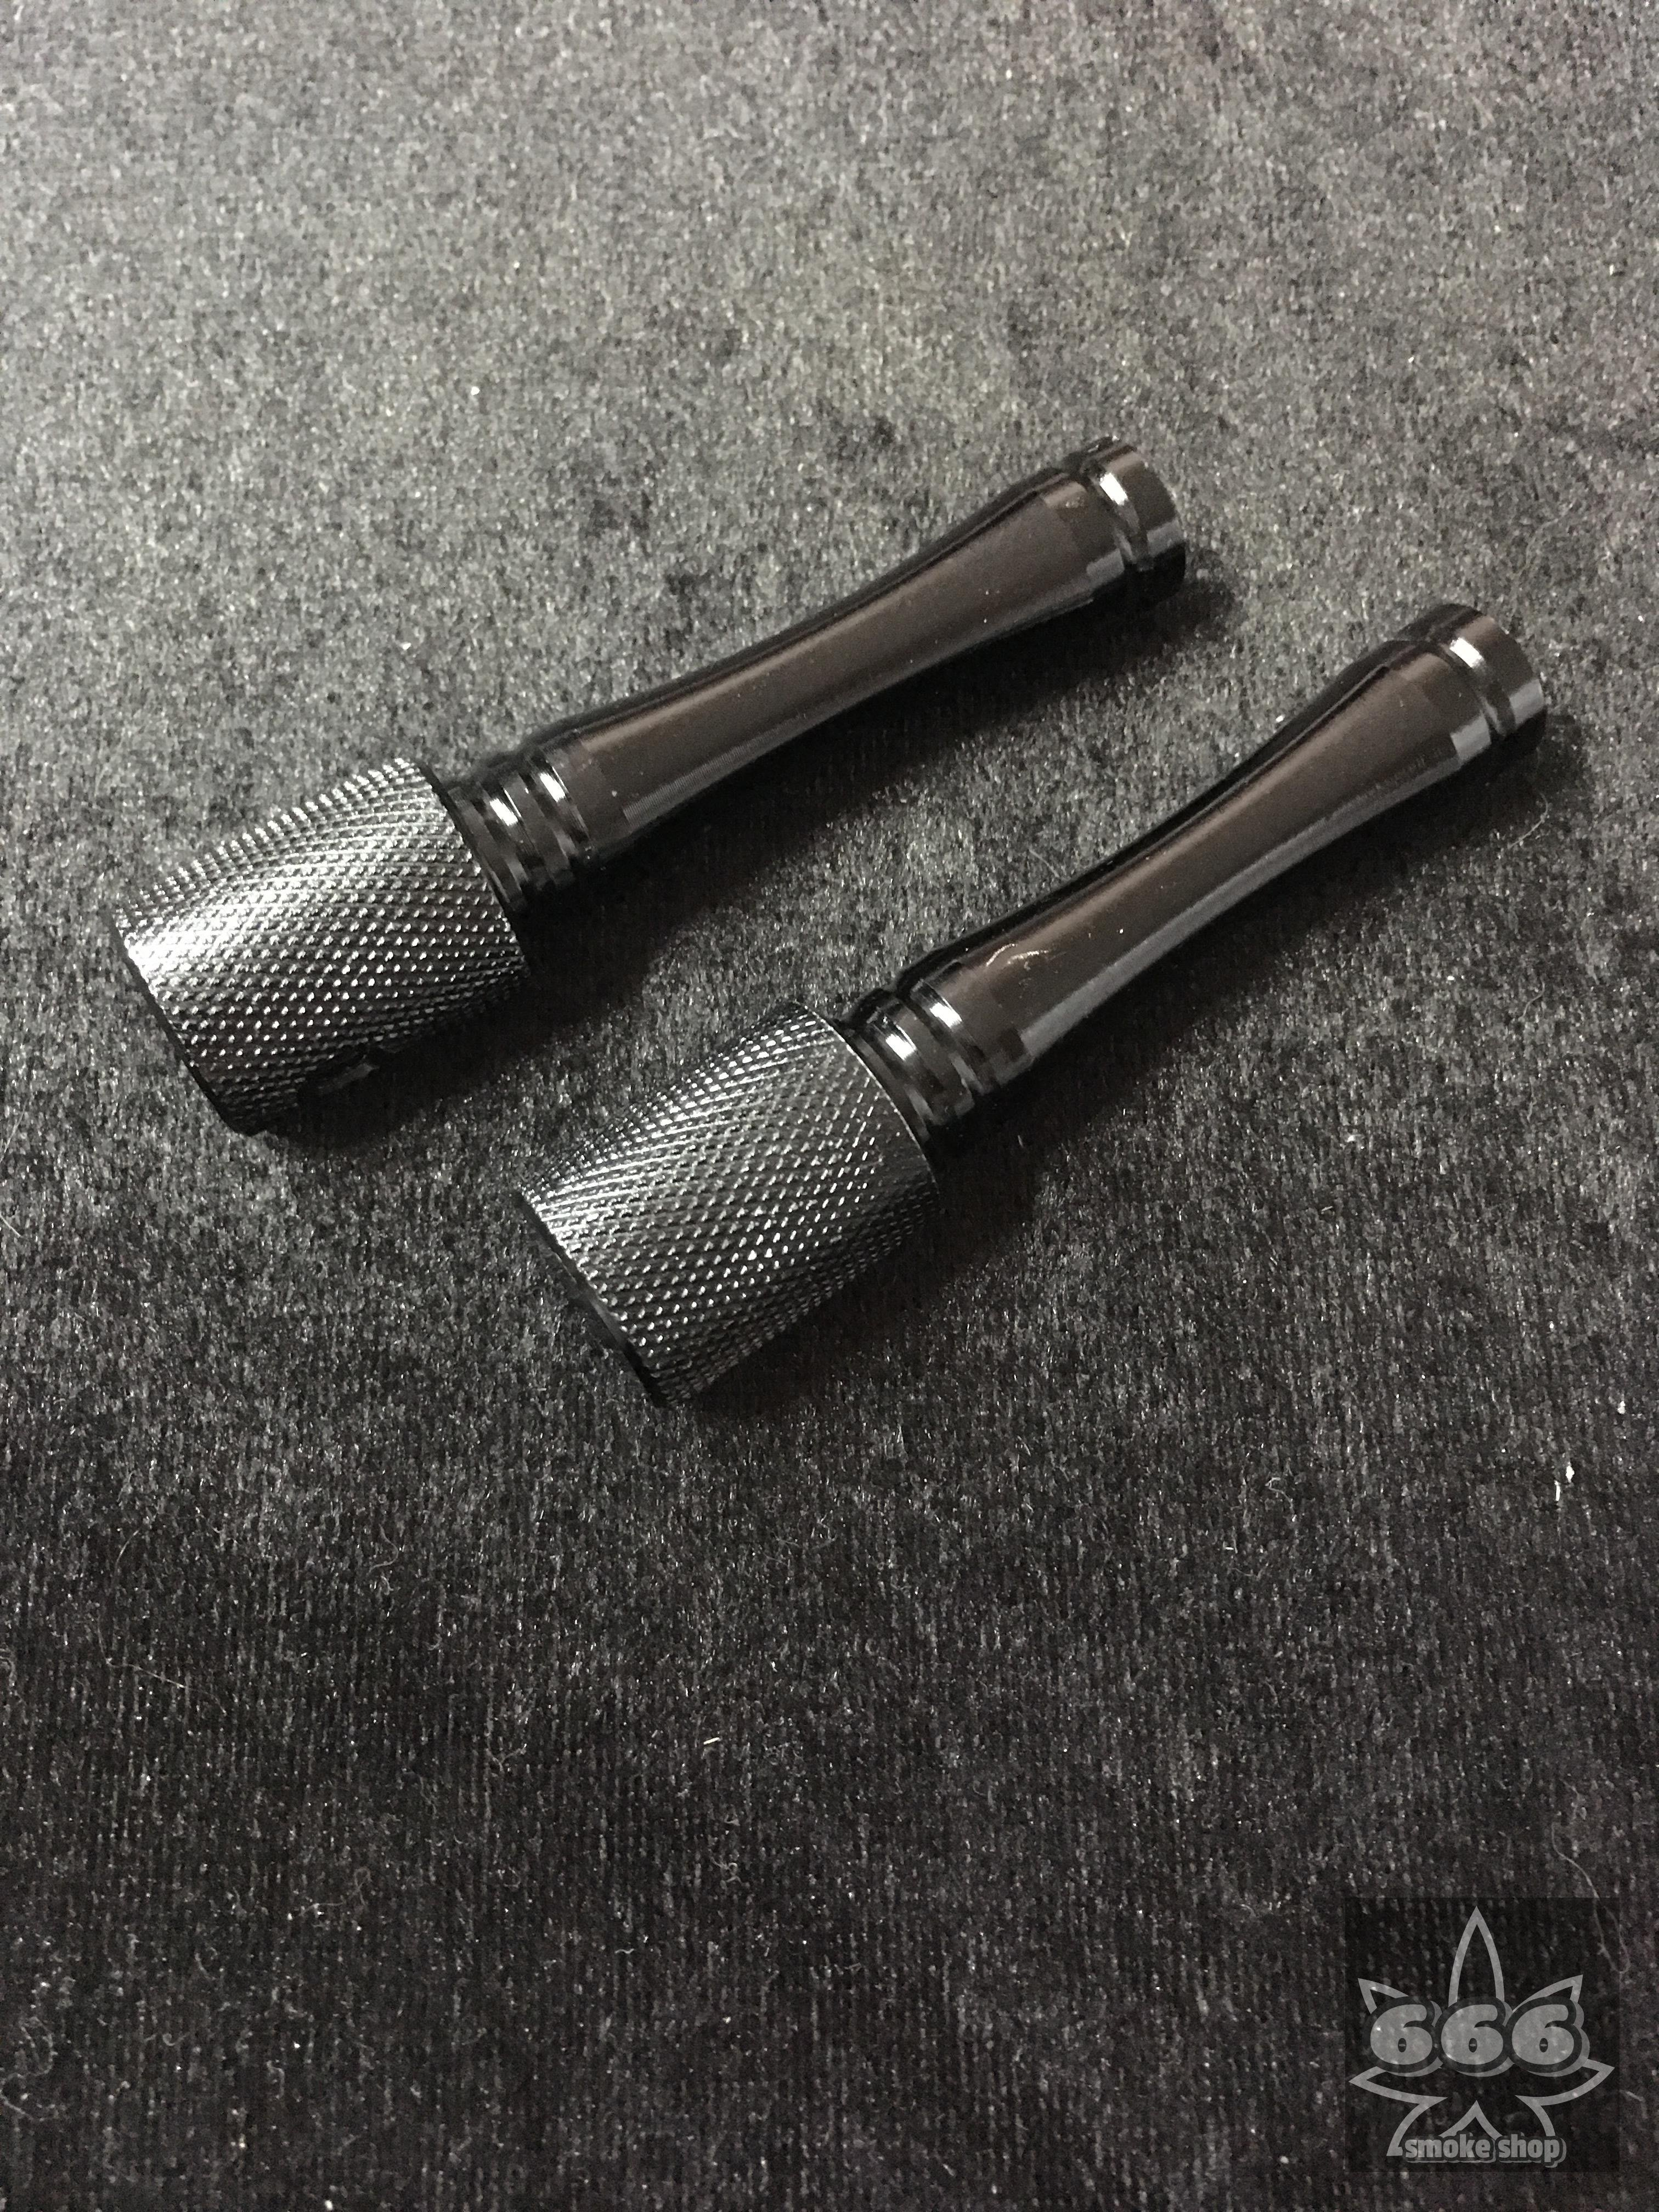 ∣666∣ smoke shop 手雷煙斗 反坦克手榴彈造型 菸斗 87mm Grenade pipe